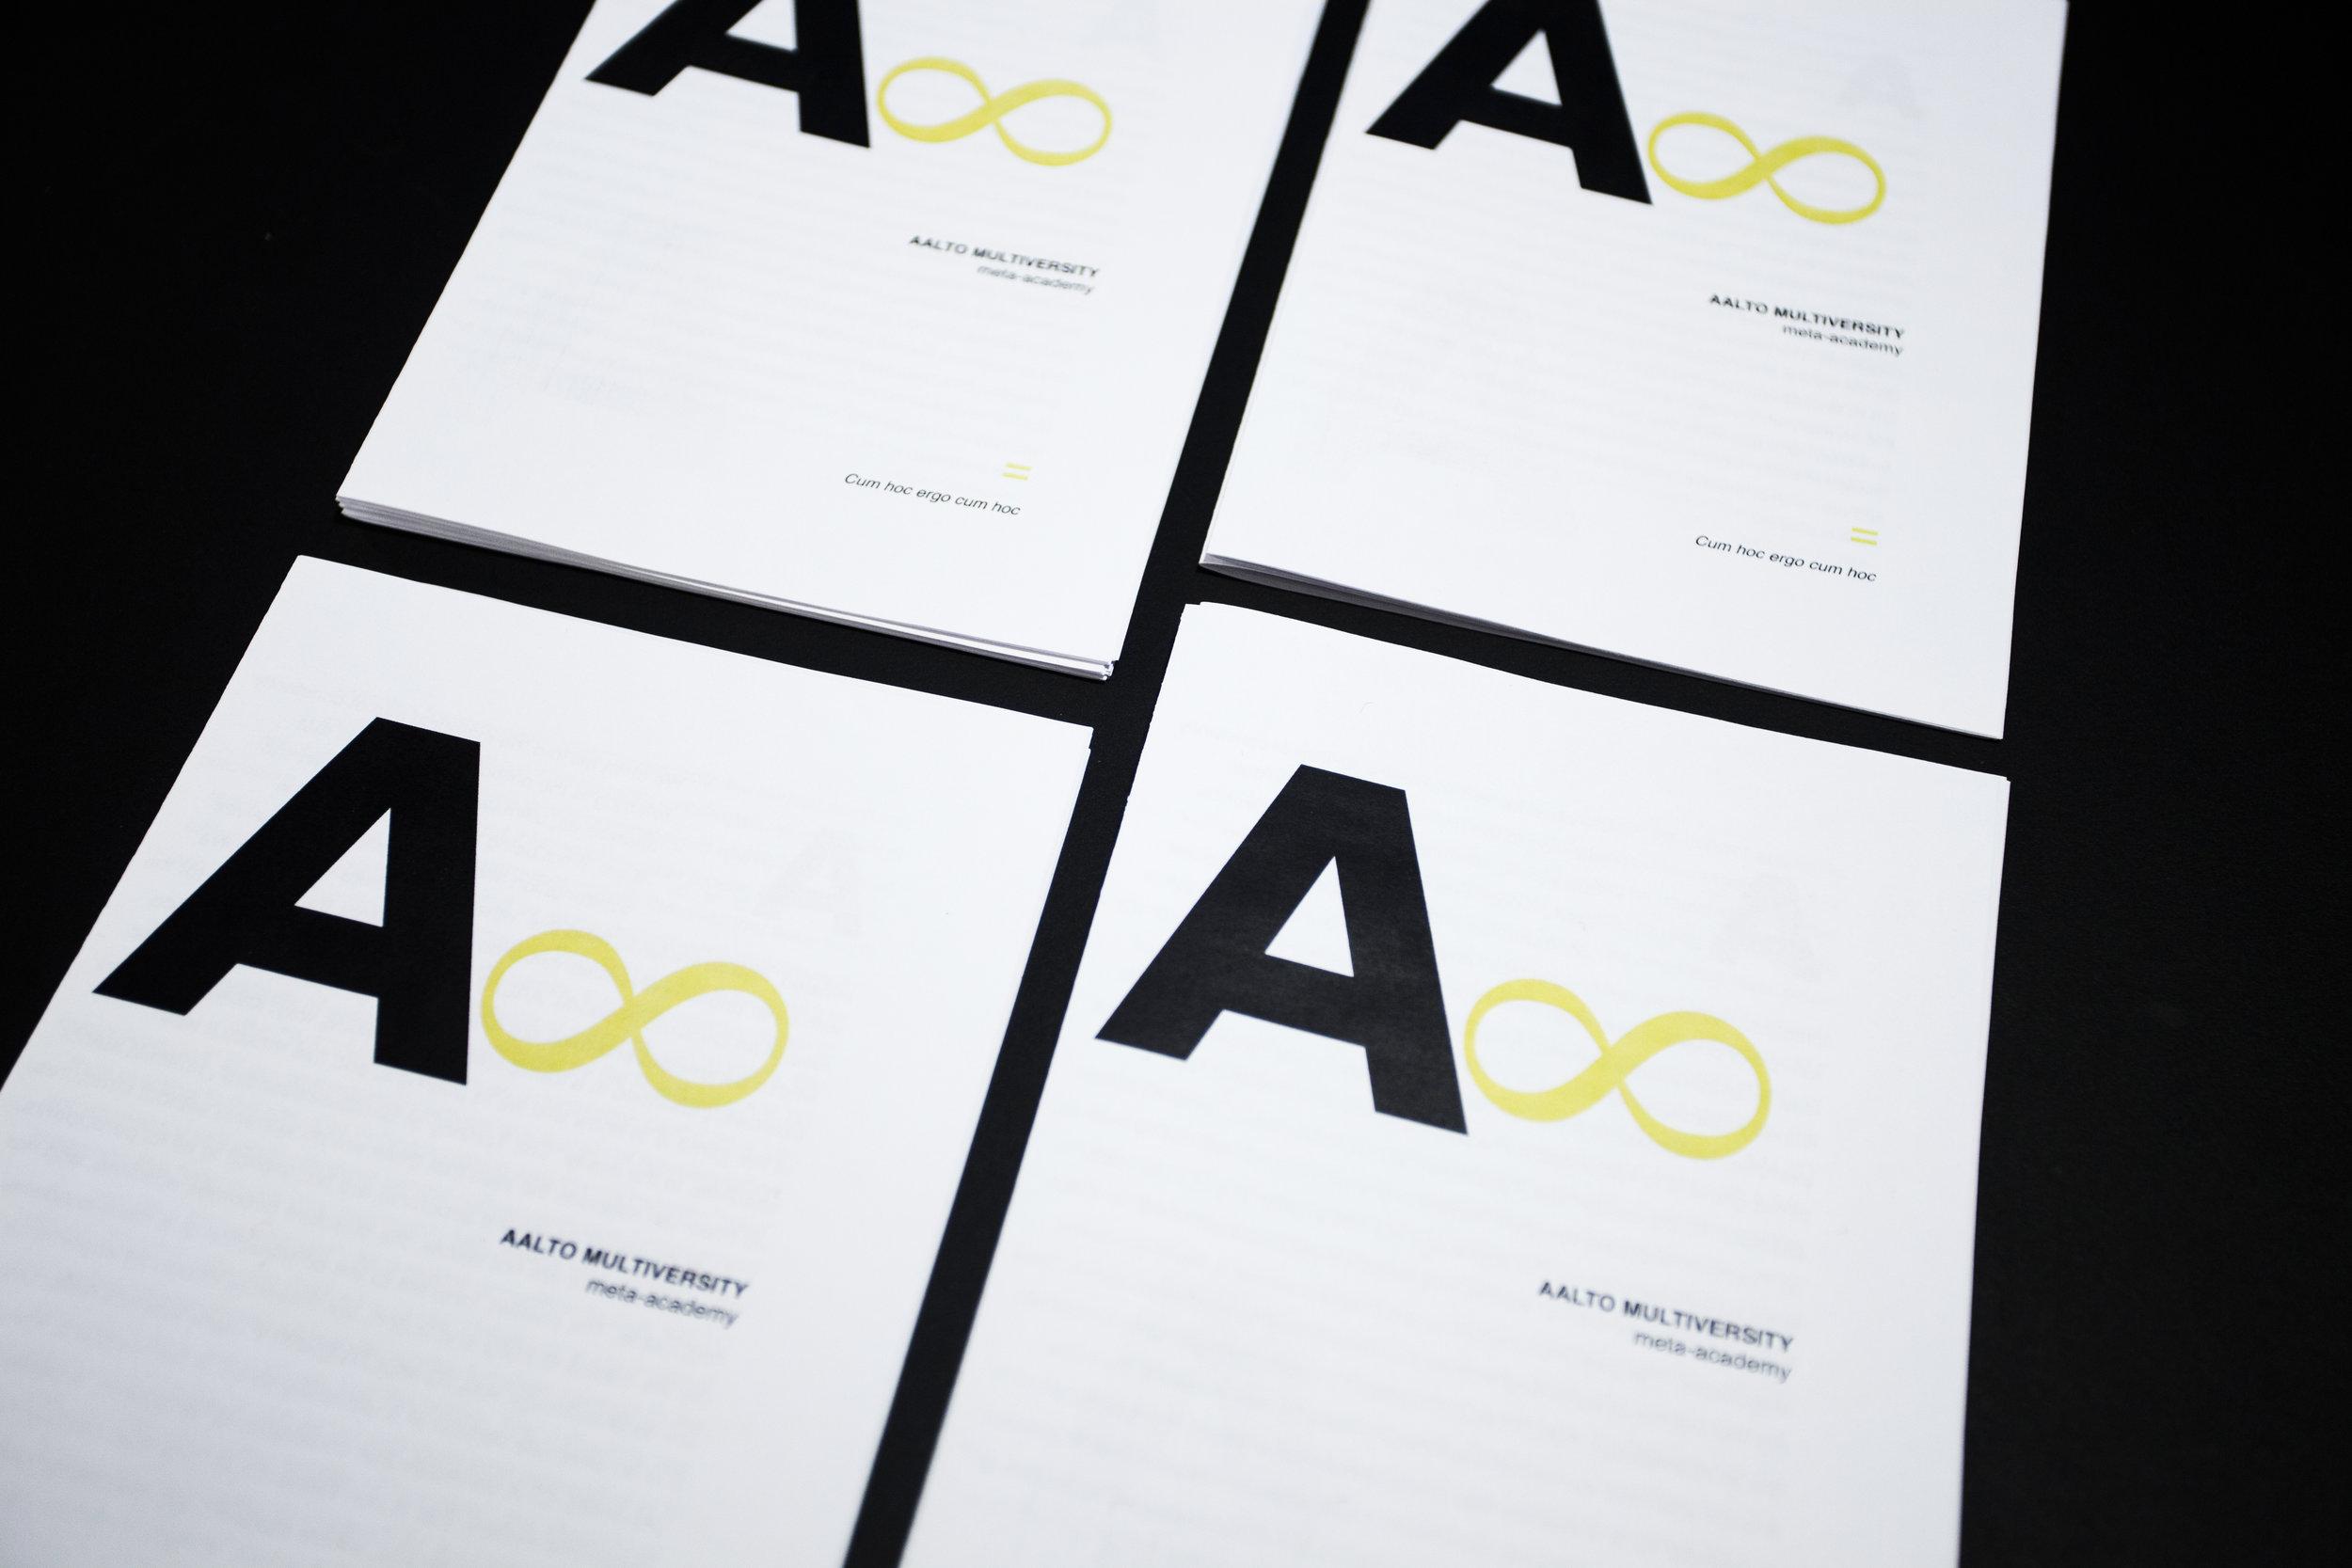 Aalto Multiversity_by Rogerio Nuno Costa_photo Jenni Holma10.jpg